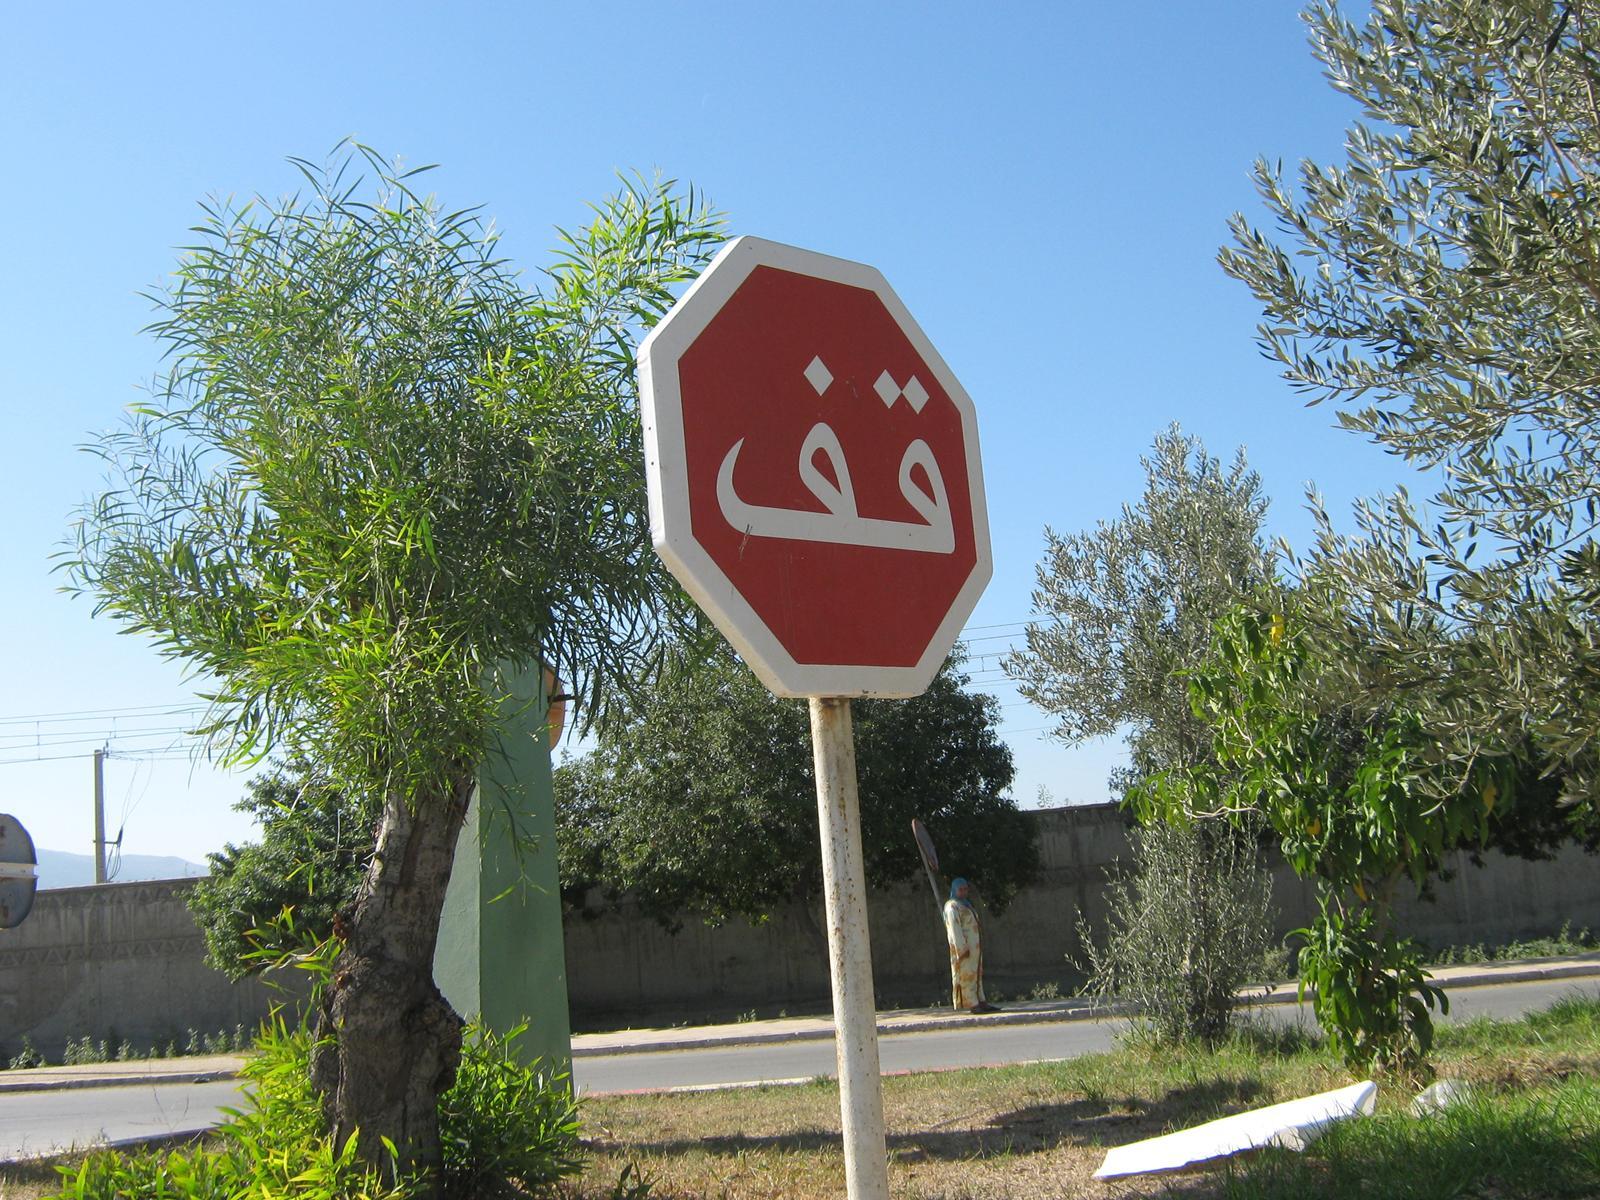 Tag 9 : Plage Aglou - El Aaiún - Marokkanisches Stopp-Schild